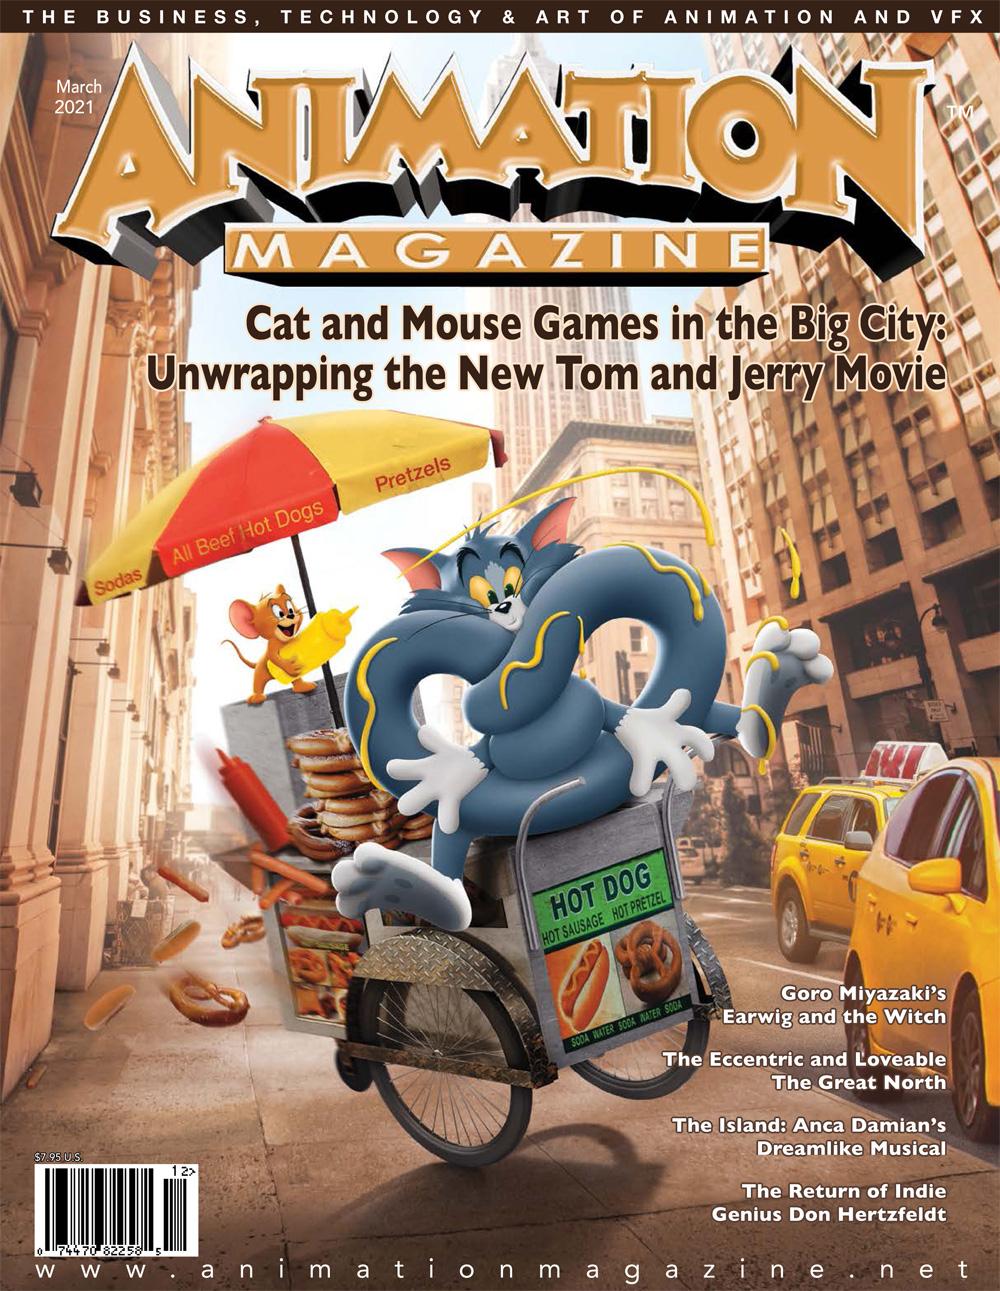 Animation Magazine – #308 March 2021